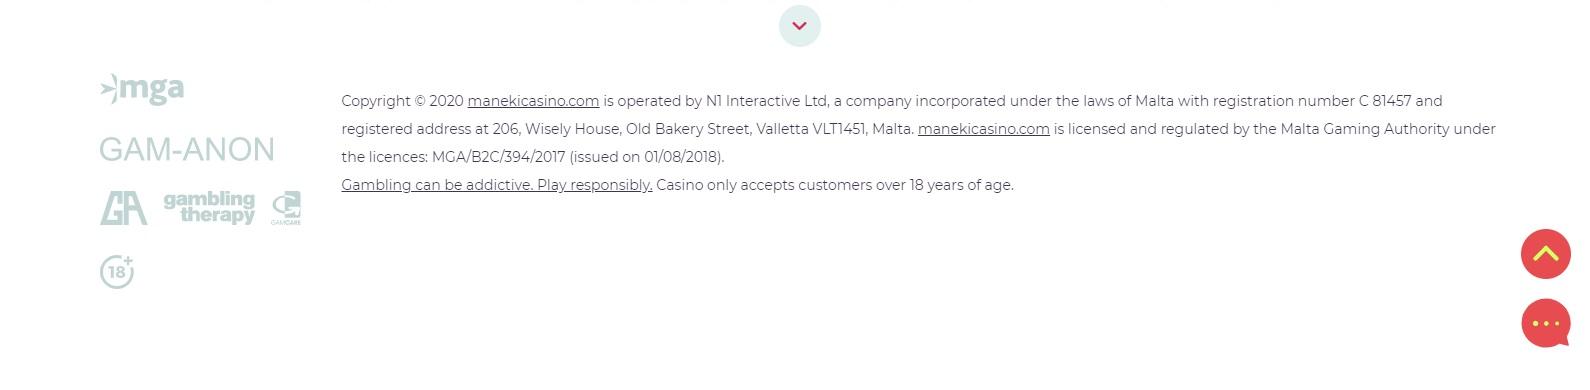 maneki casino licentie